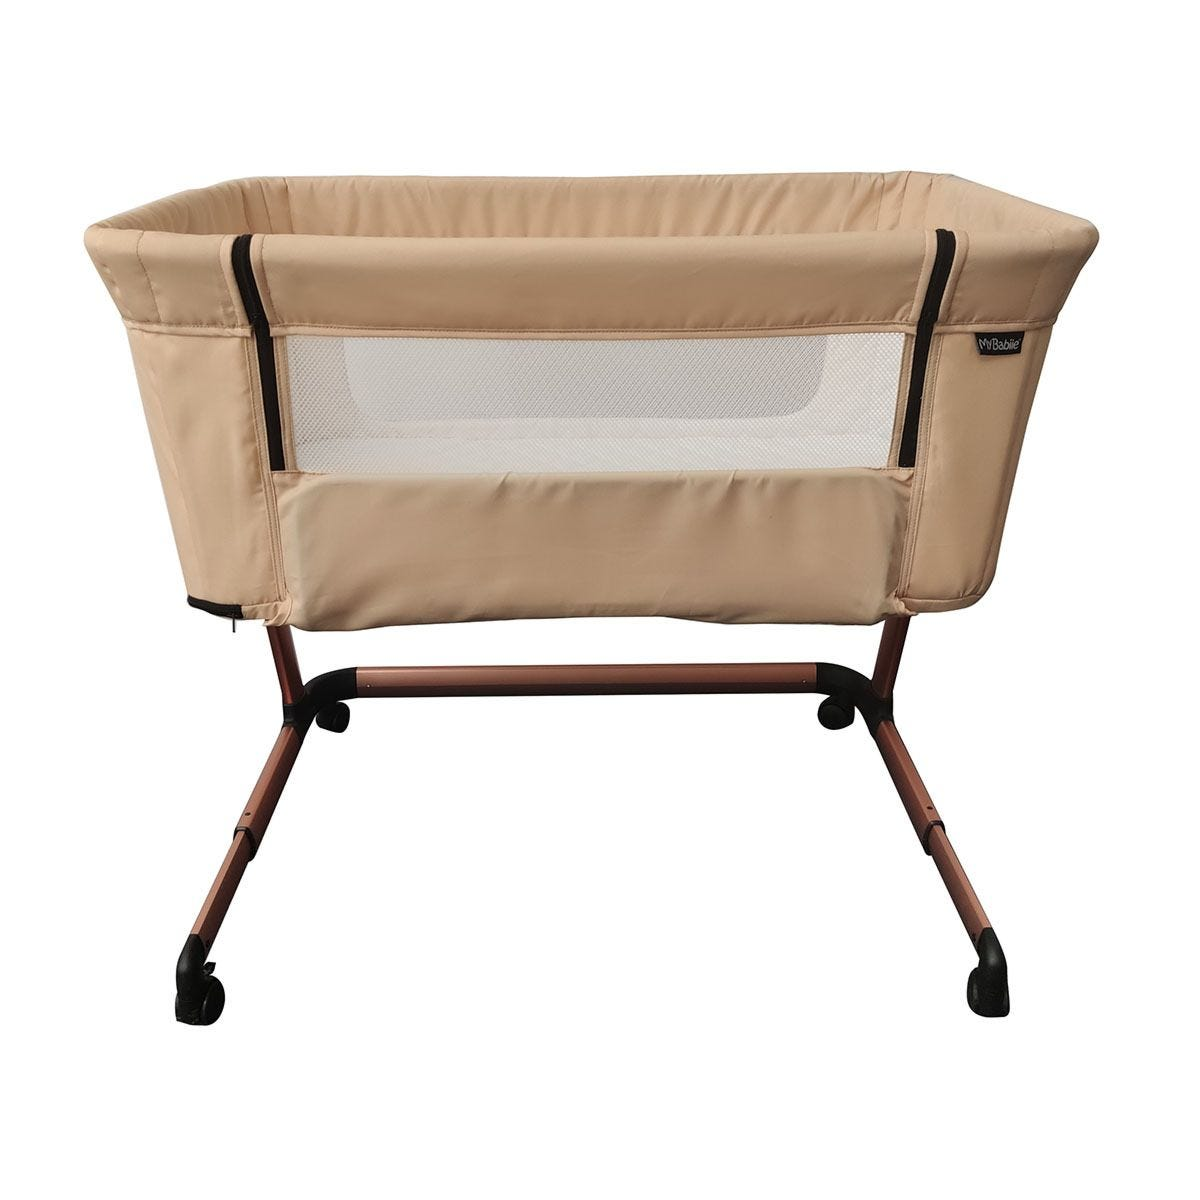 My Babiie Closer Bedside Crib - Rose Gold Blush